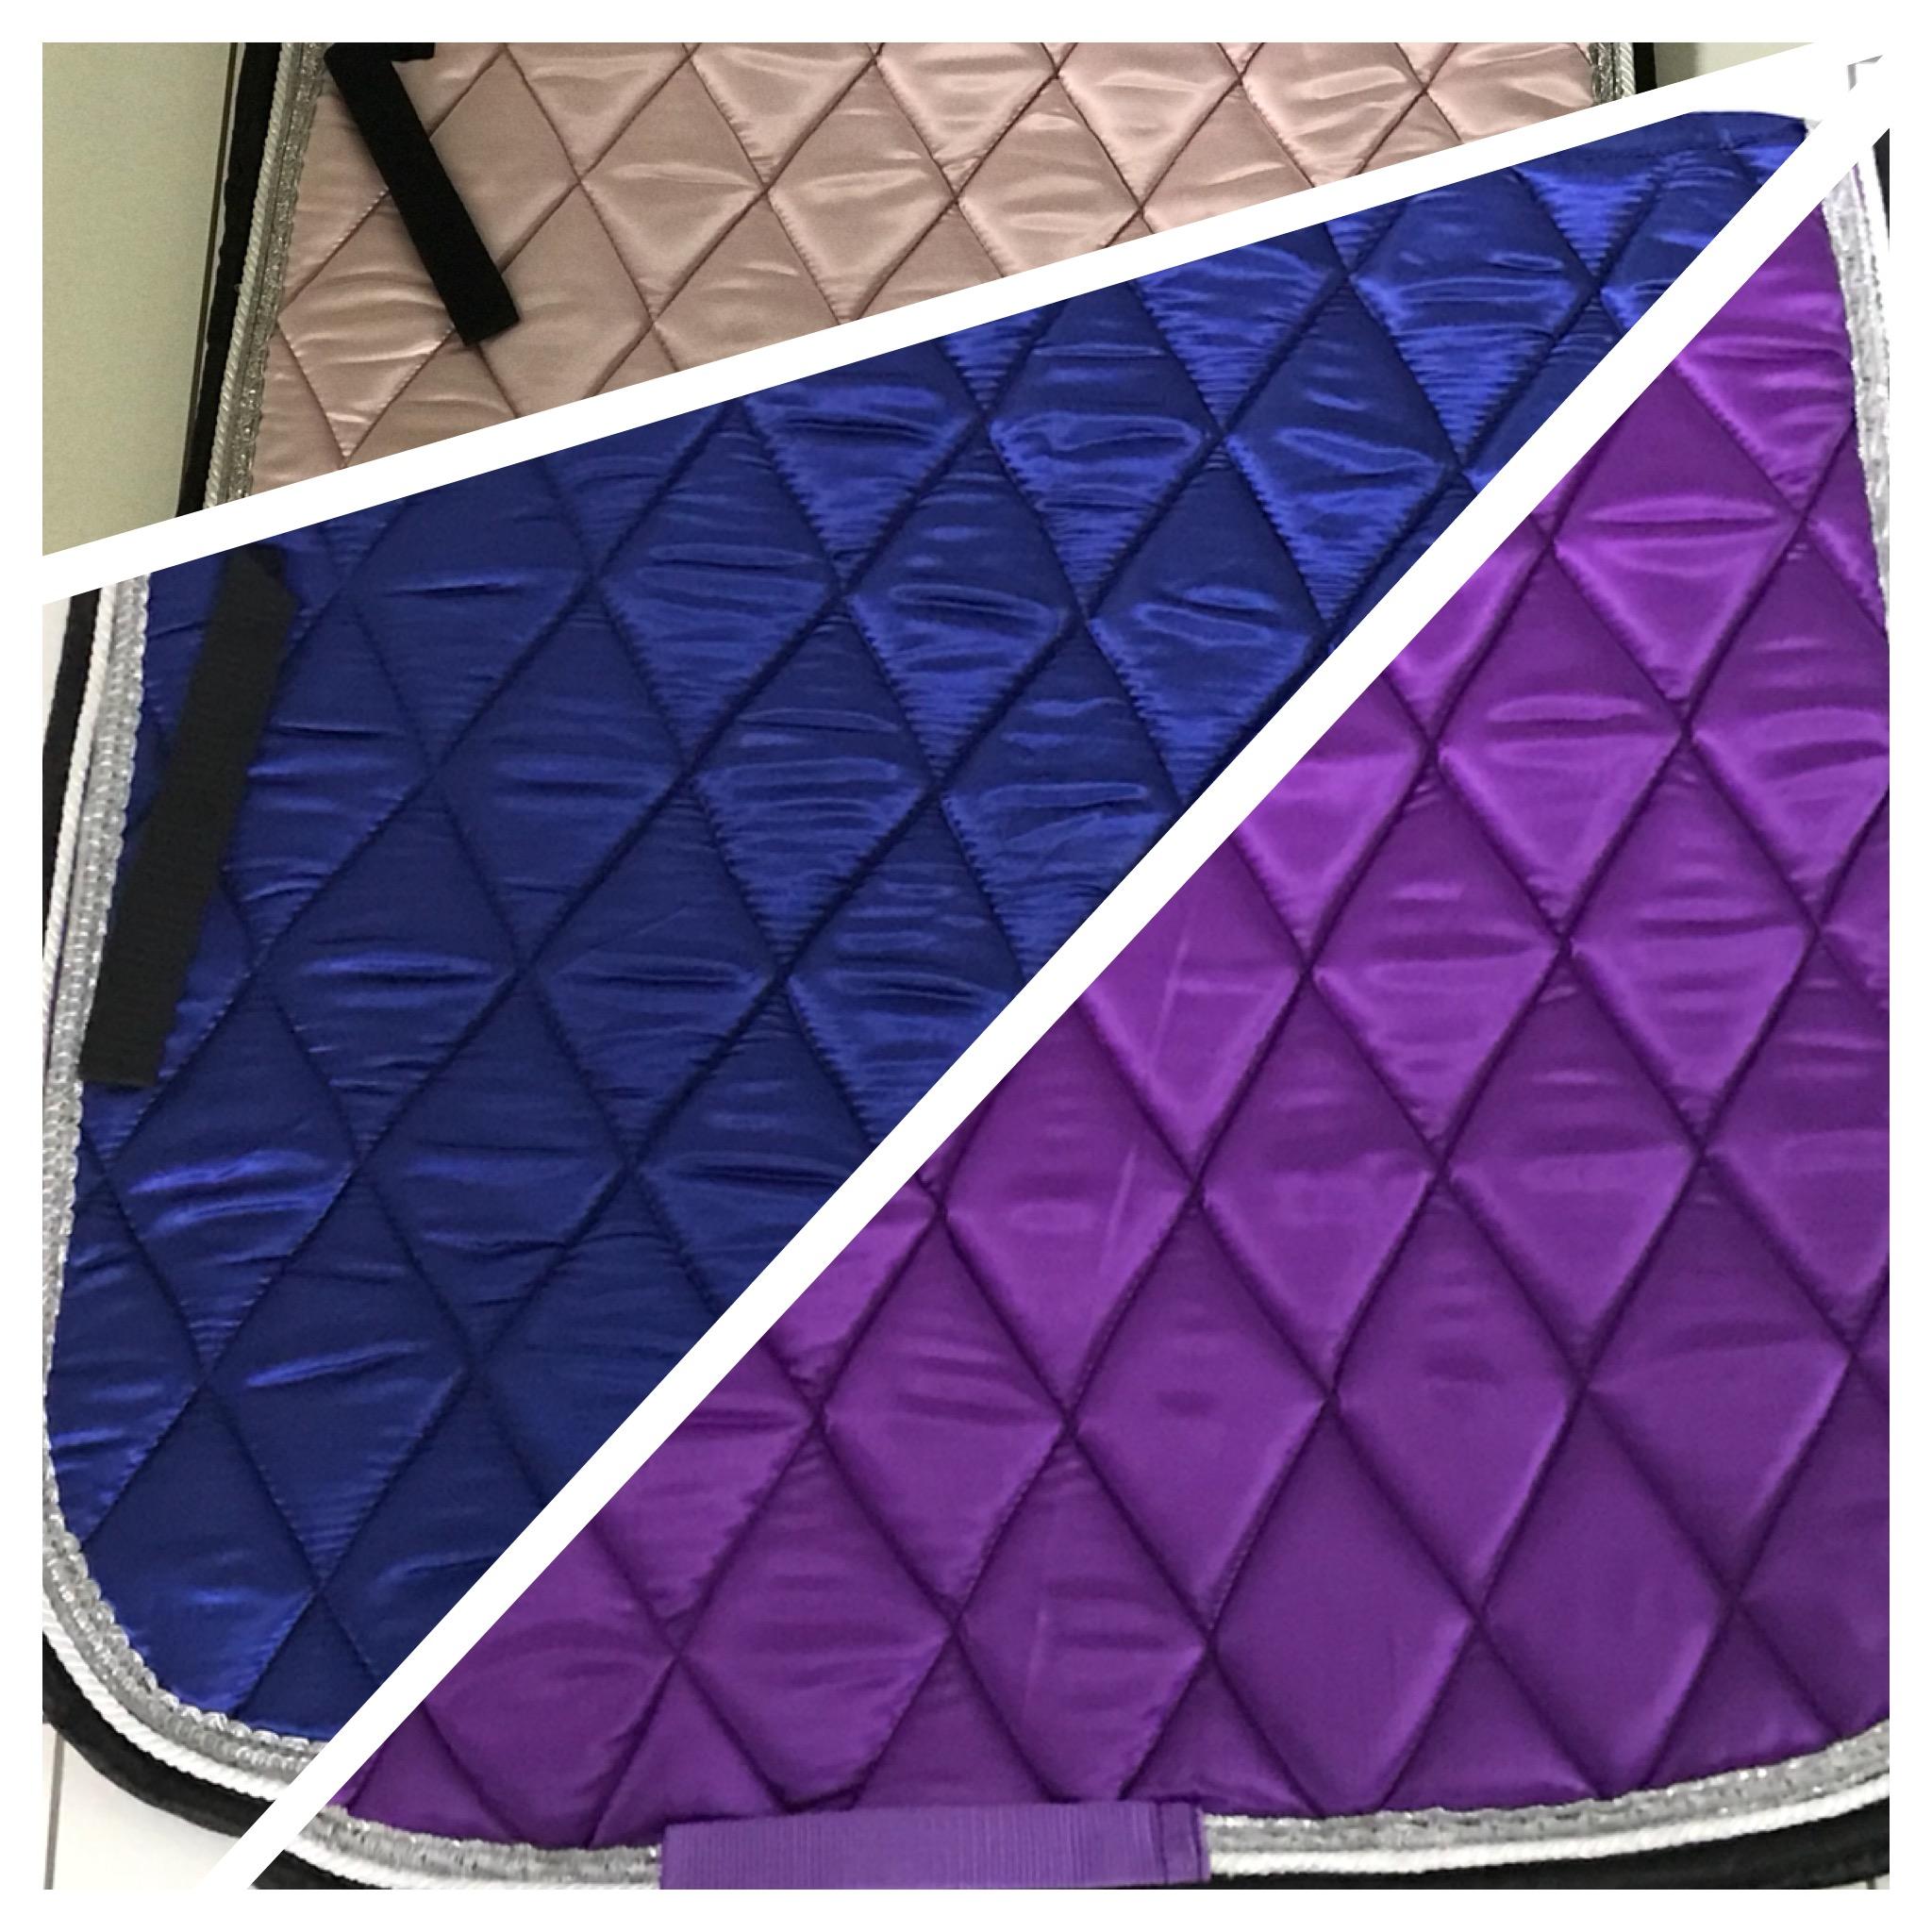 Dressur trendige Schabracke in TOP Farben Metallic FR2